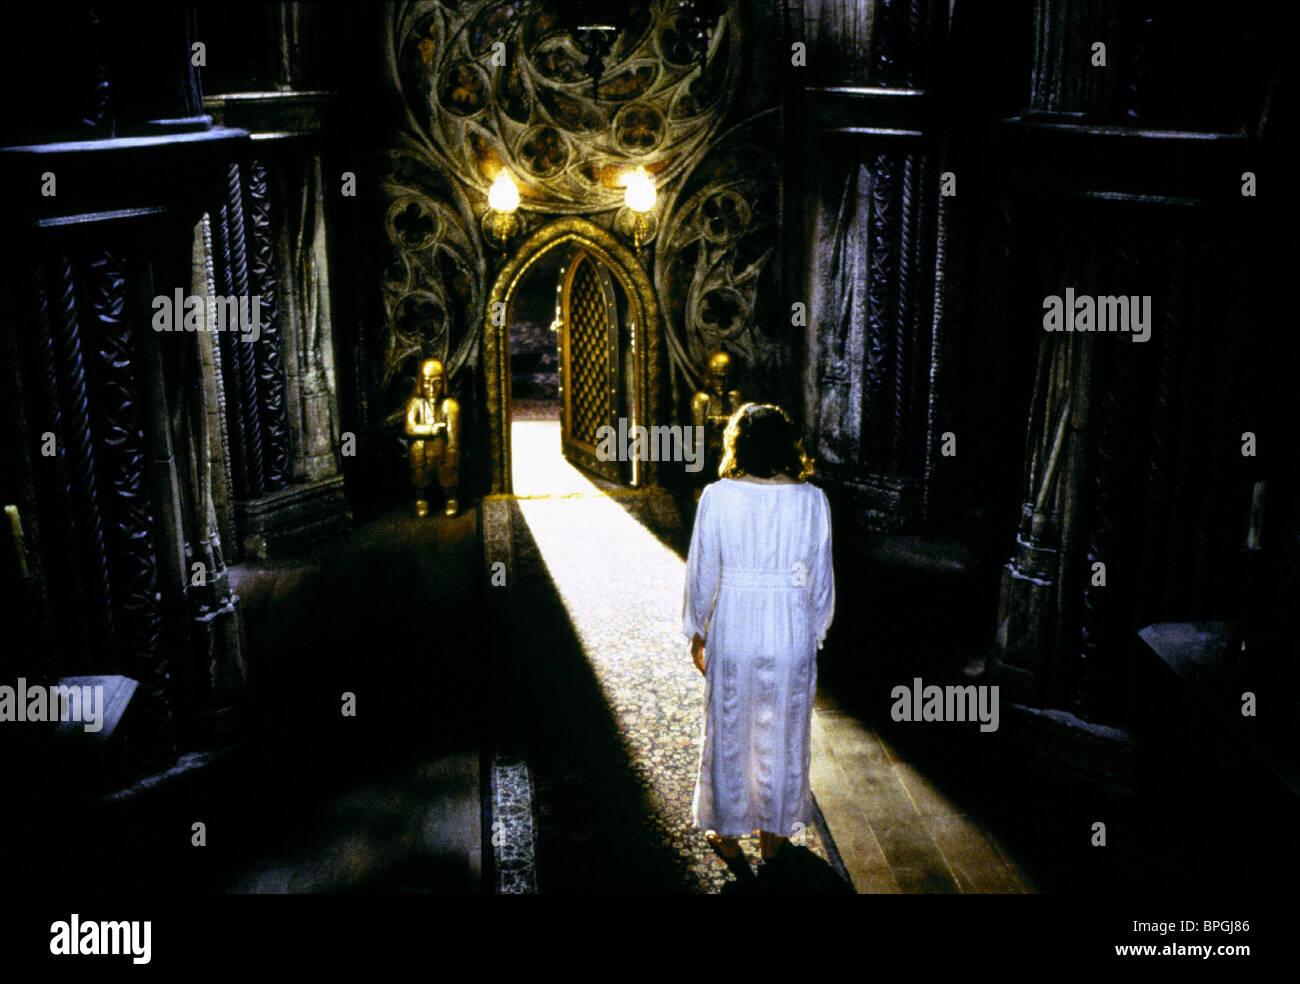 LILI TAYLOR THE HAUNTING (1999) - Stock Image